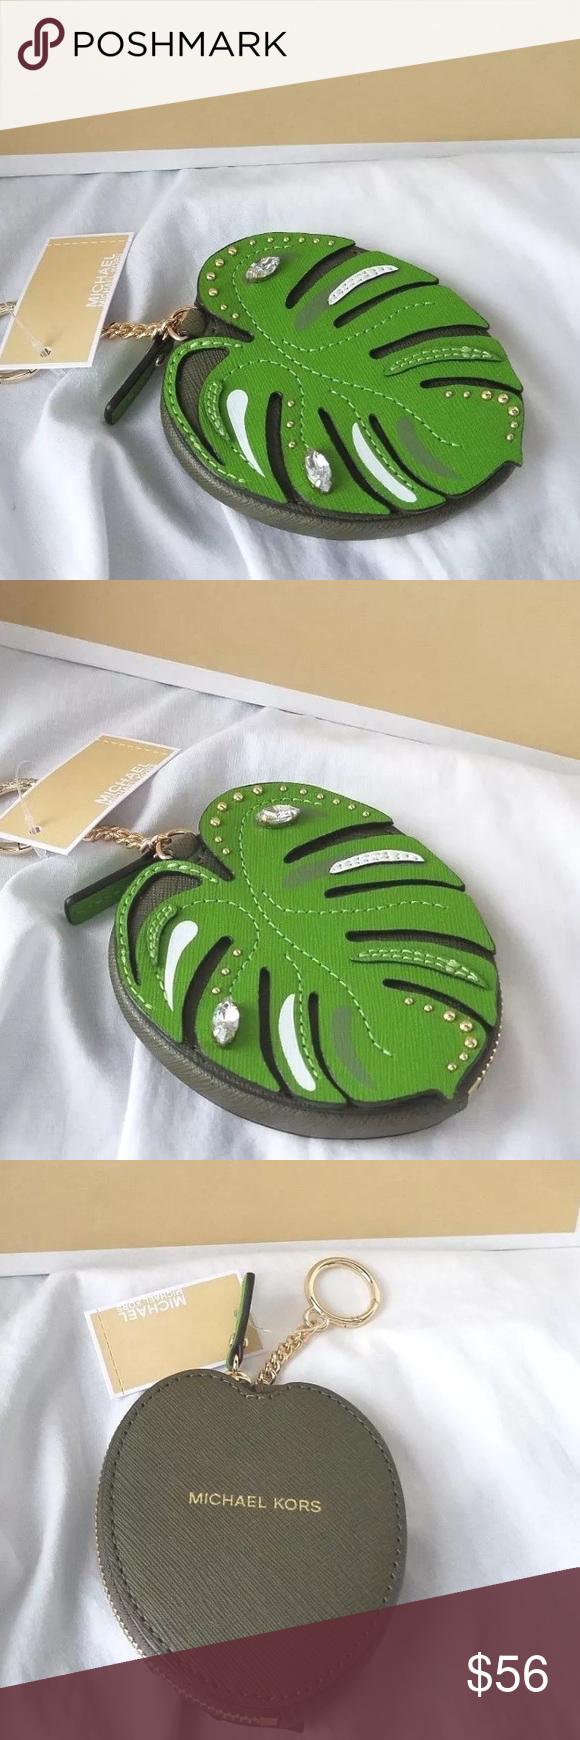 acc4632193ad80 Authentic Michael kors Palm leaf coin /key holder Authentic Michael Kors New  design Leather Palm